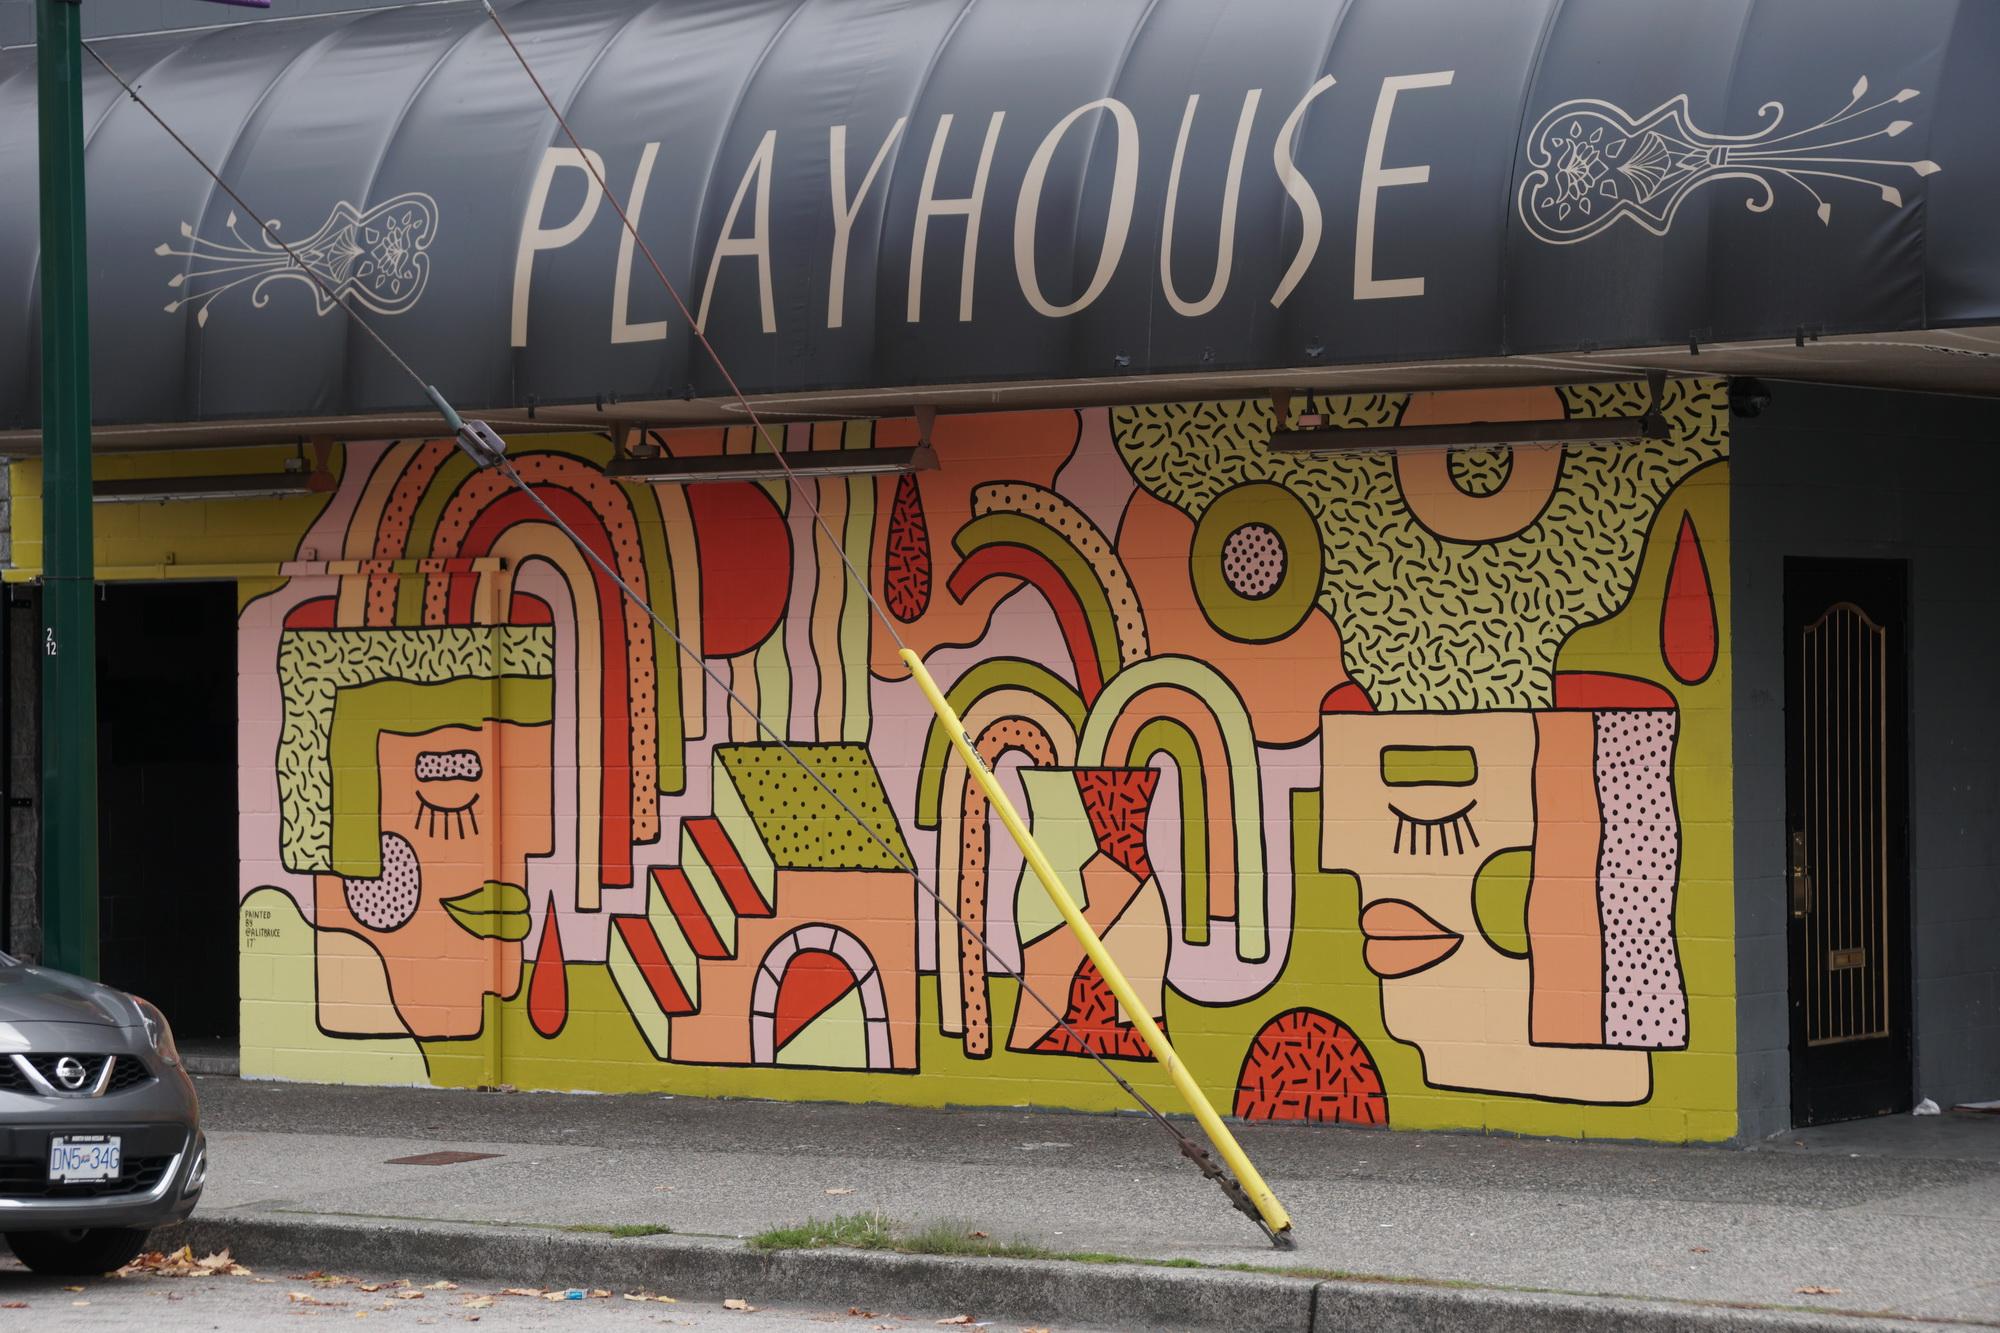 Playhouse.Thurlow